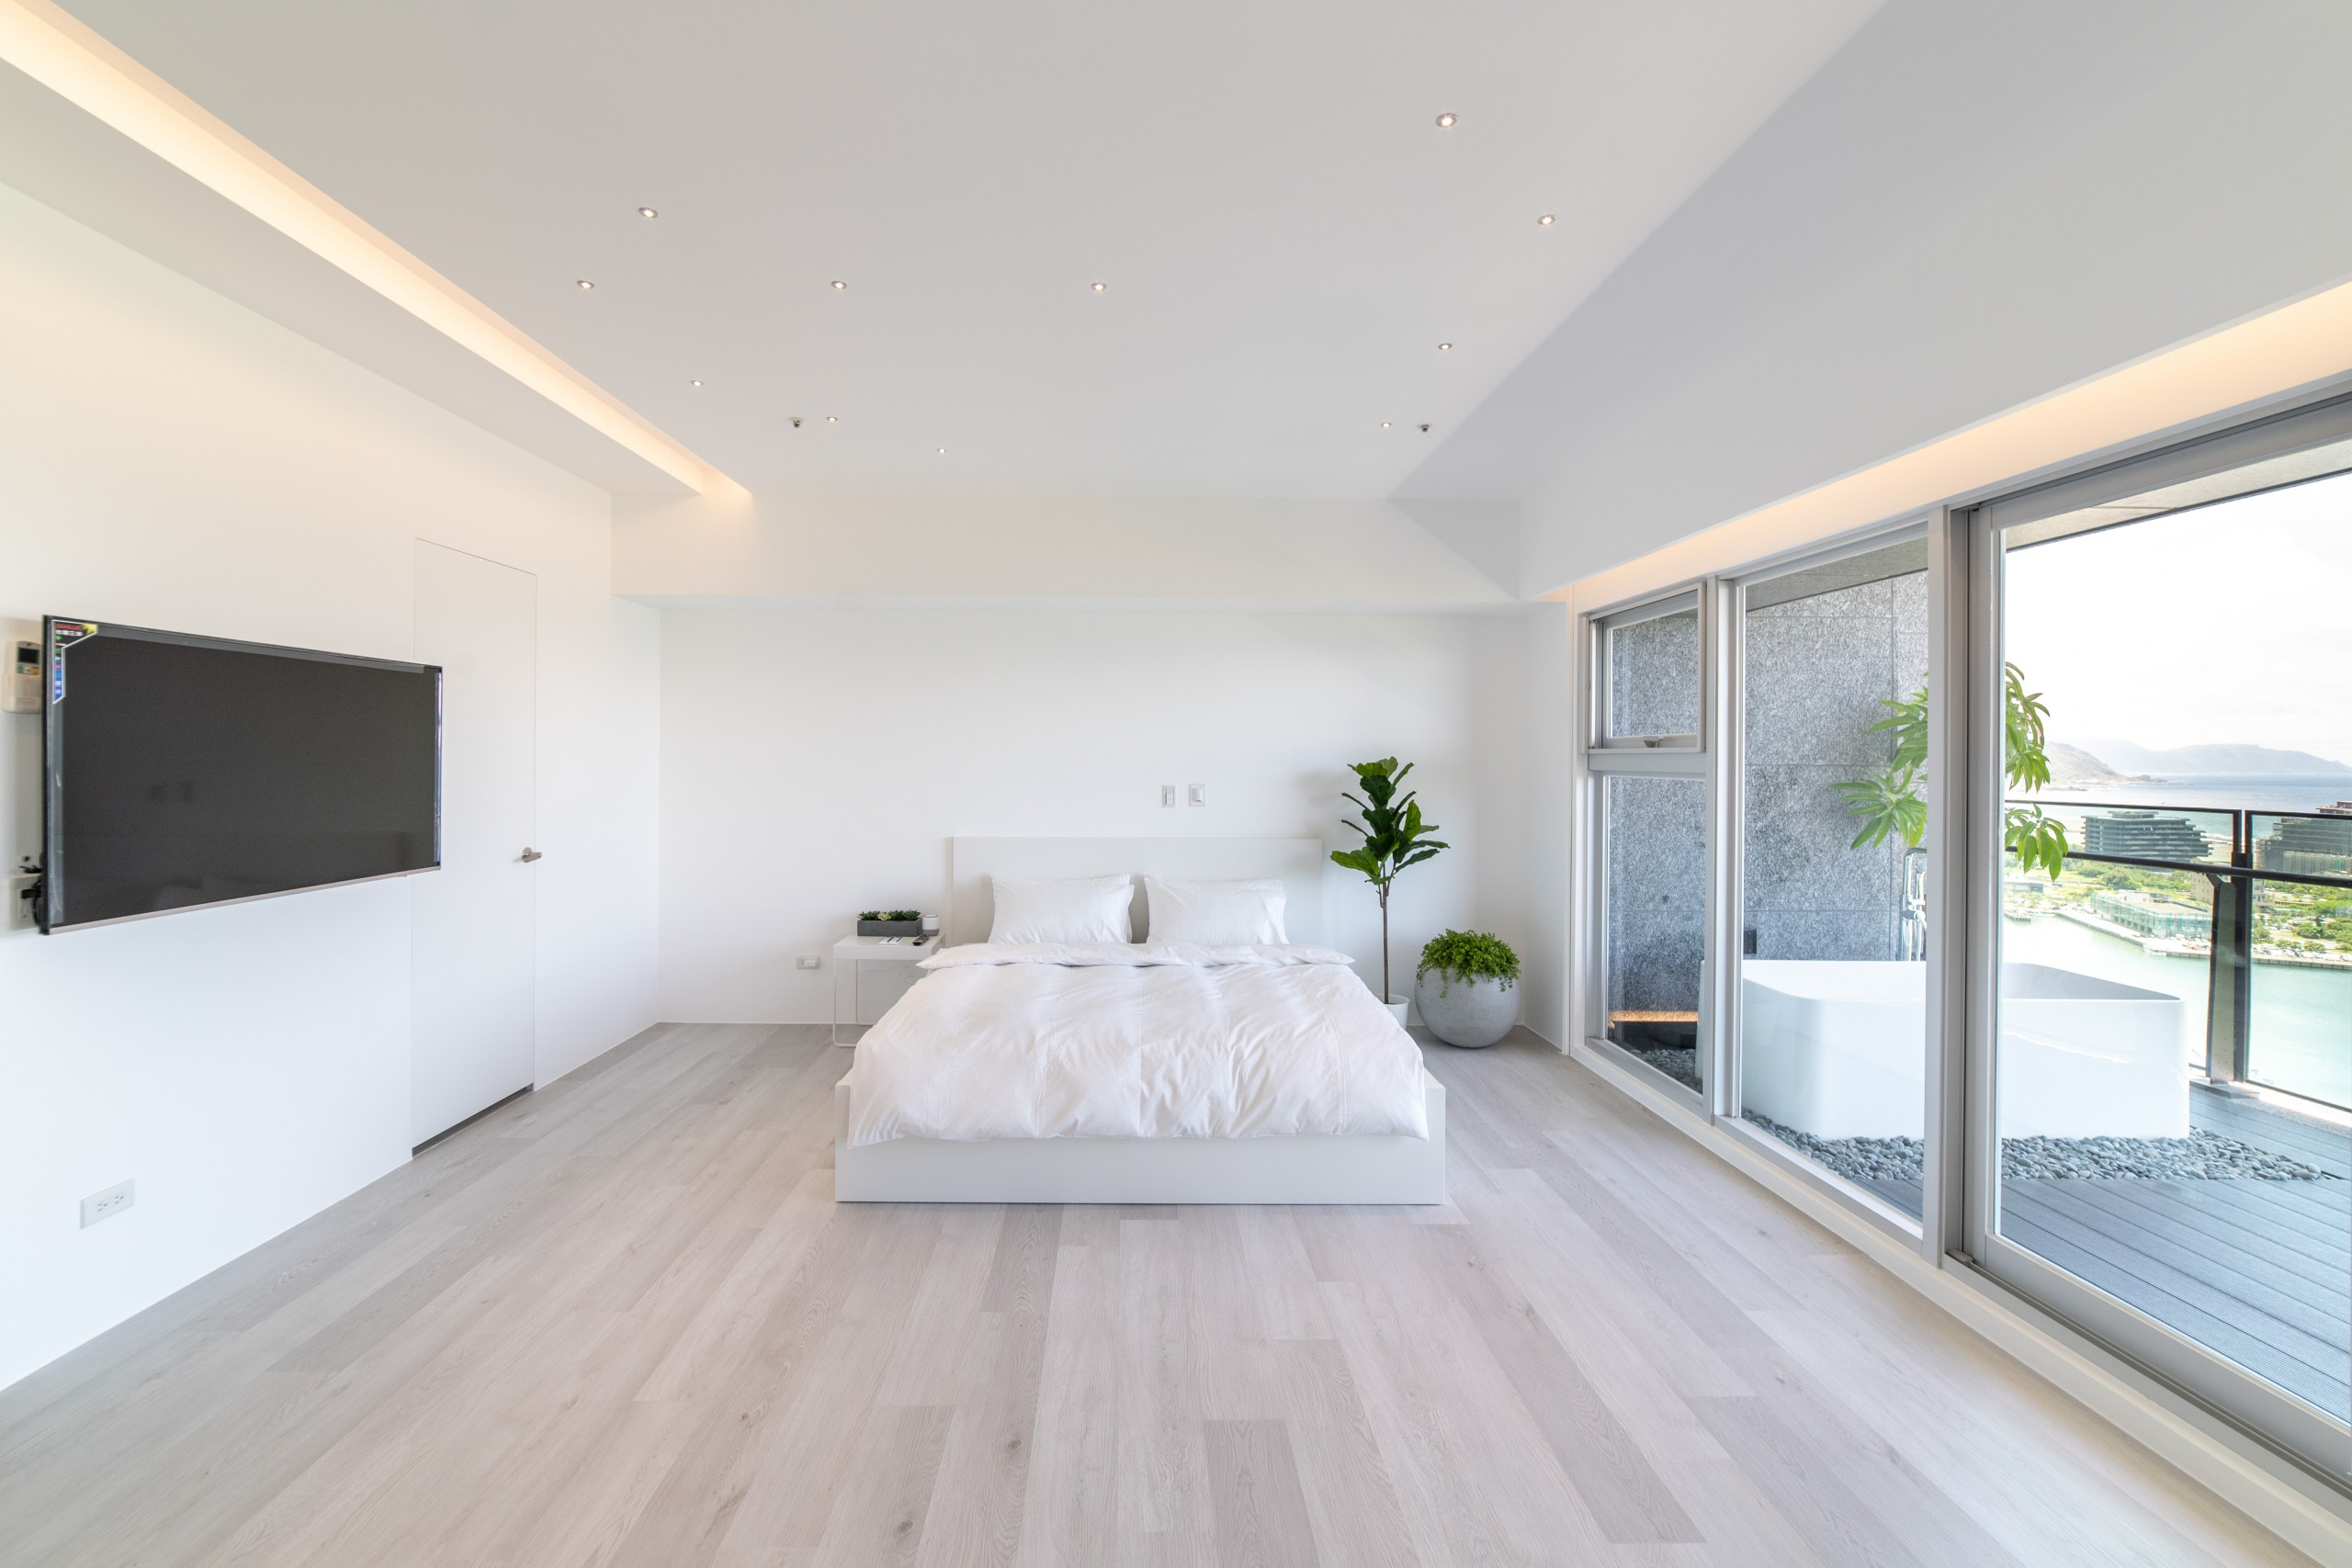 德築-DEZU-project-世界灣自宅裝修-architecture-interior-3